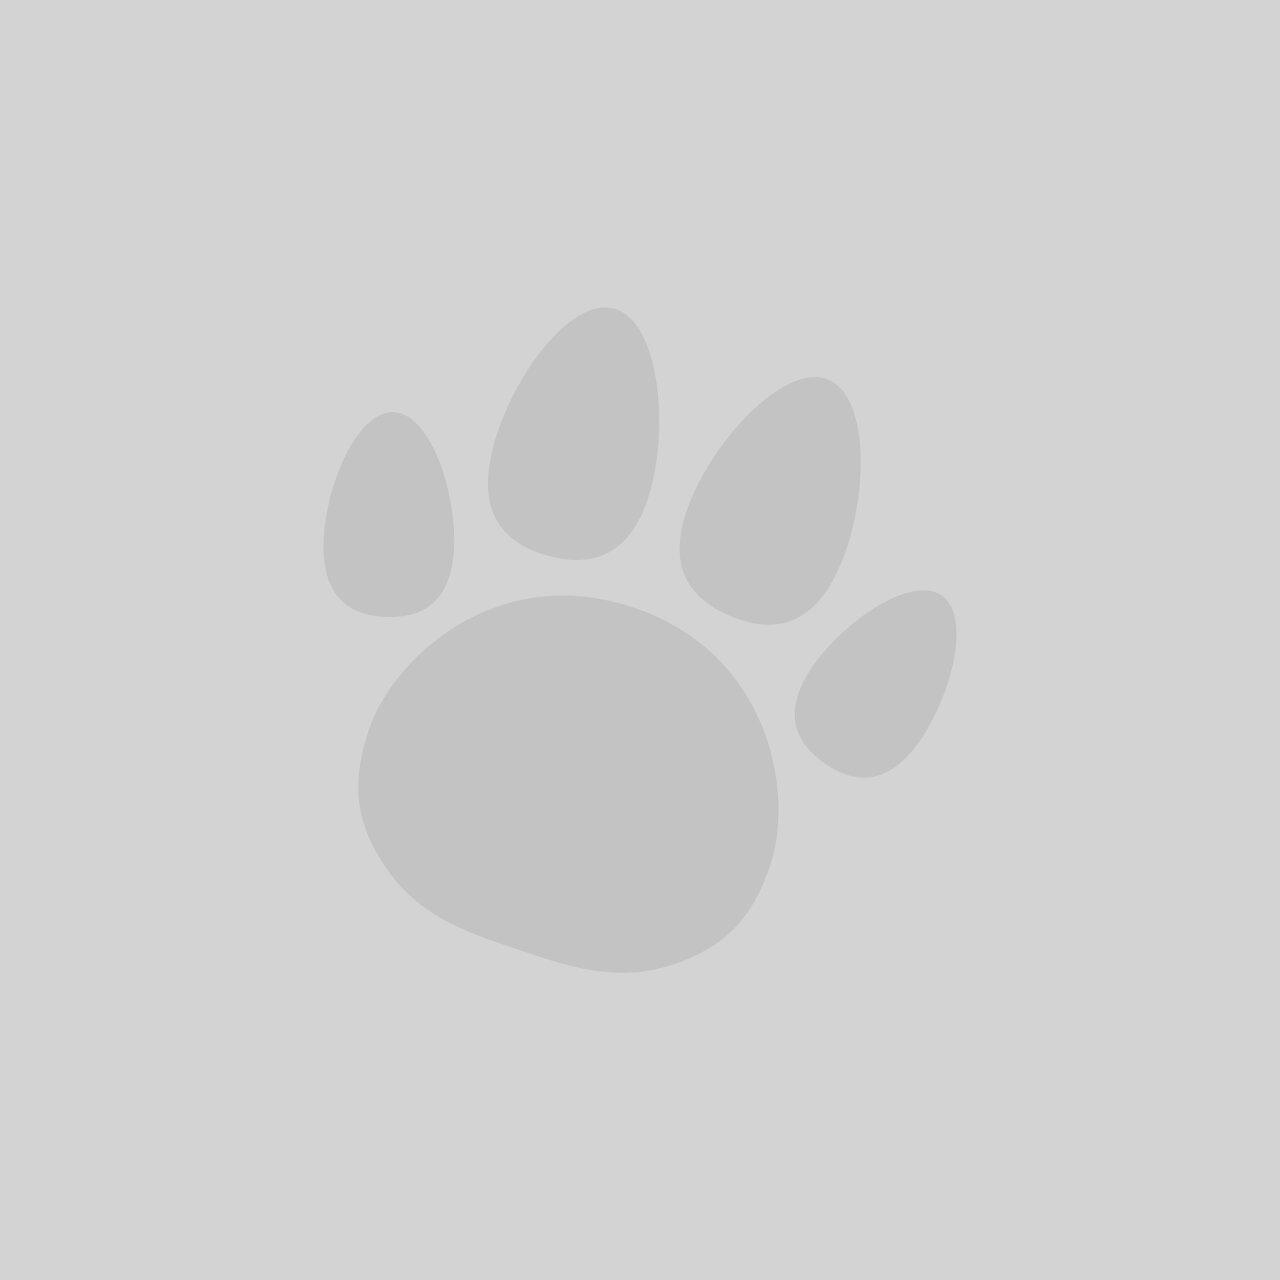 Oval Cord Tartan Dog Cushion (Size Options Available)